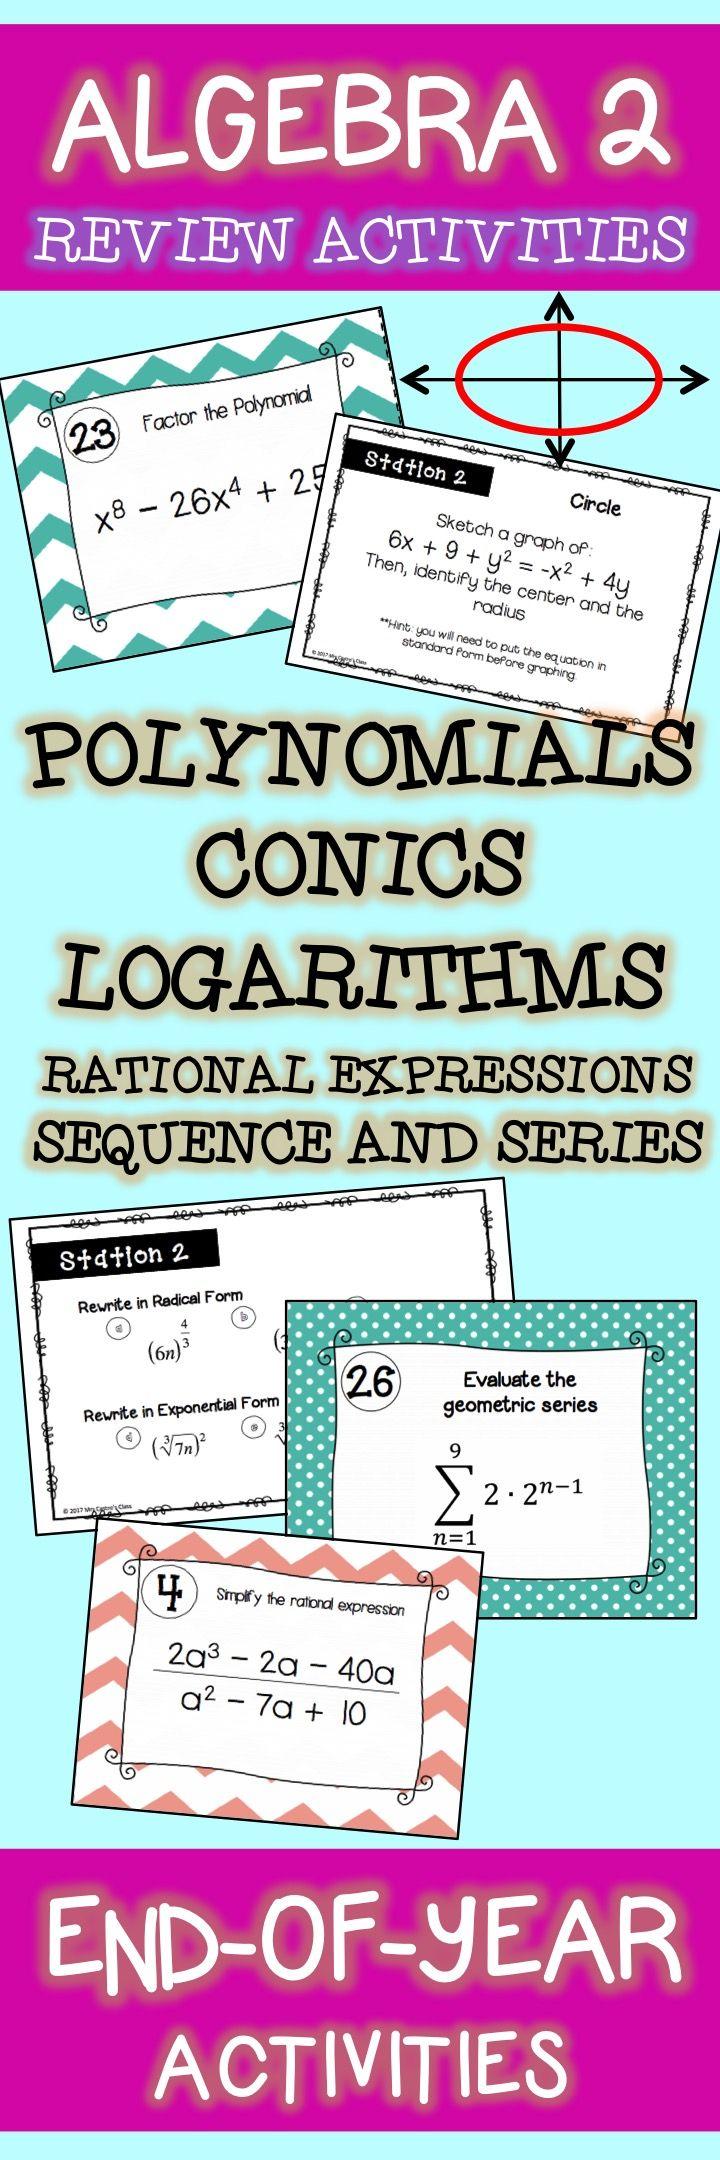 671 best Algebra toolbox images on Pinterest | Teaching math ...